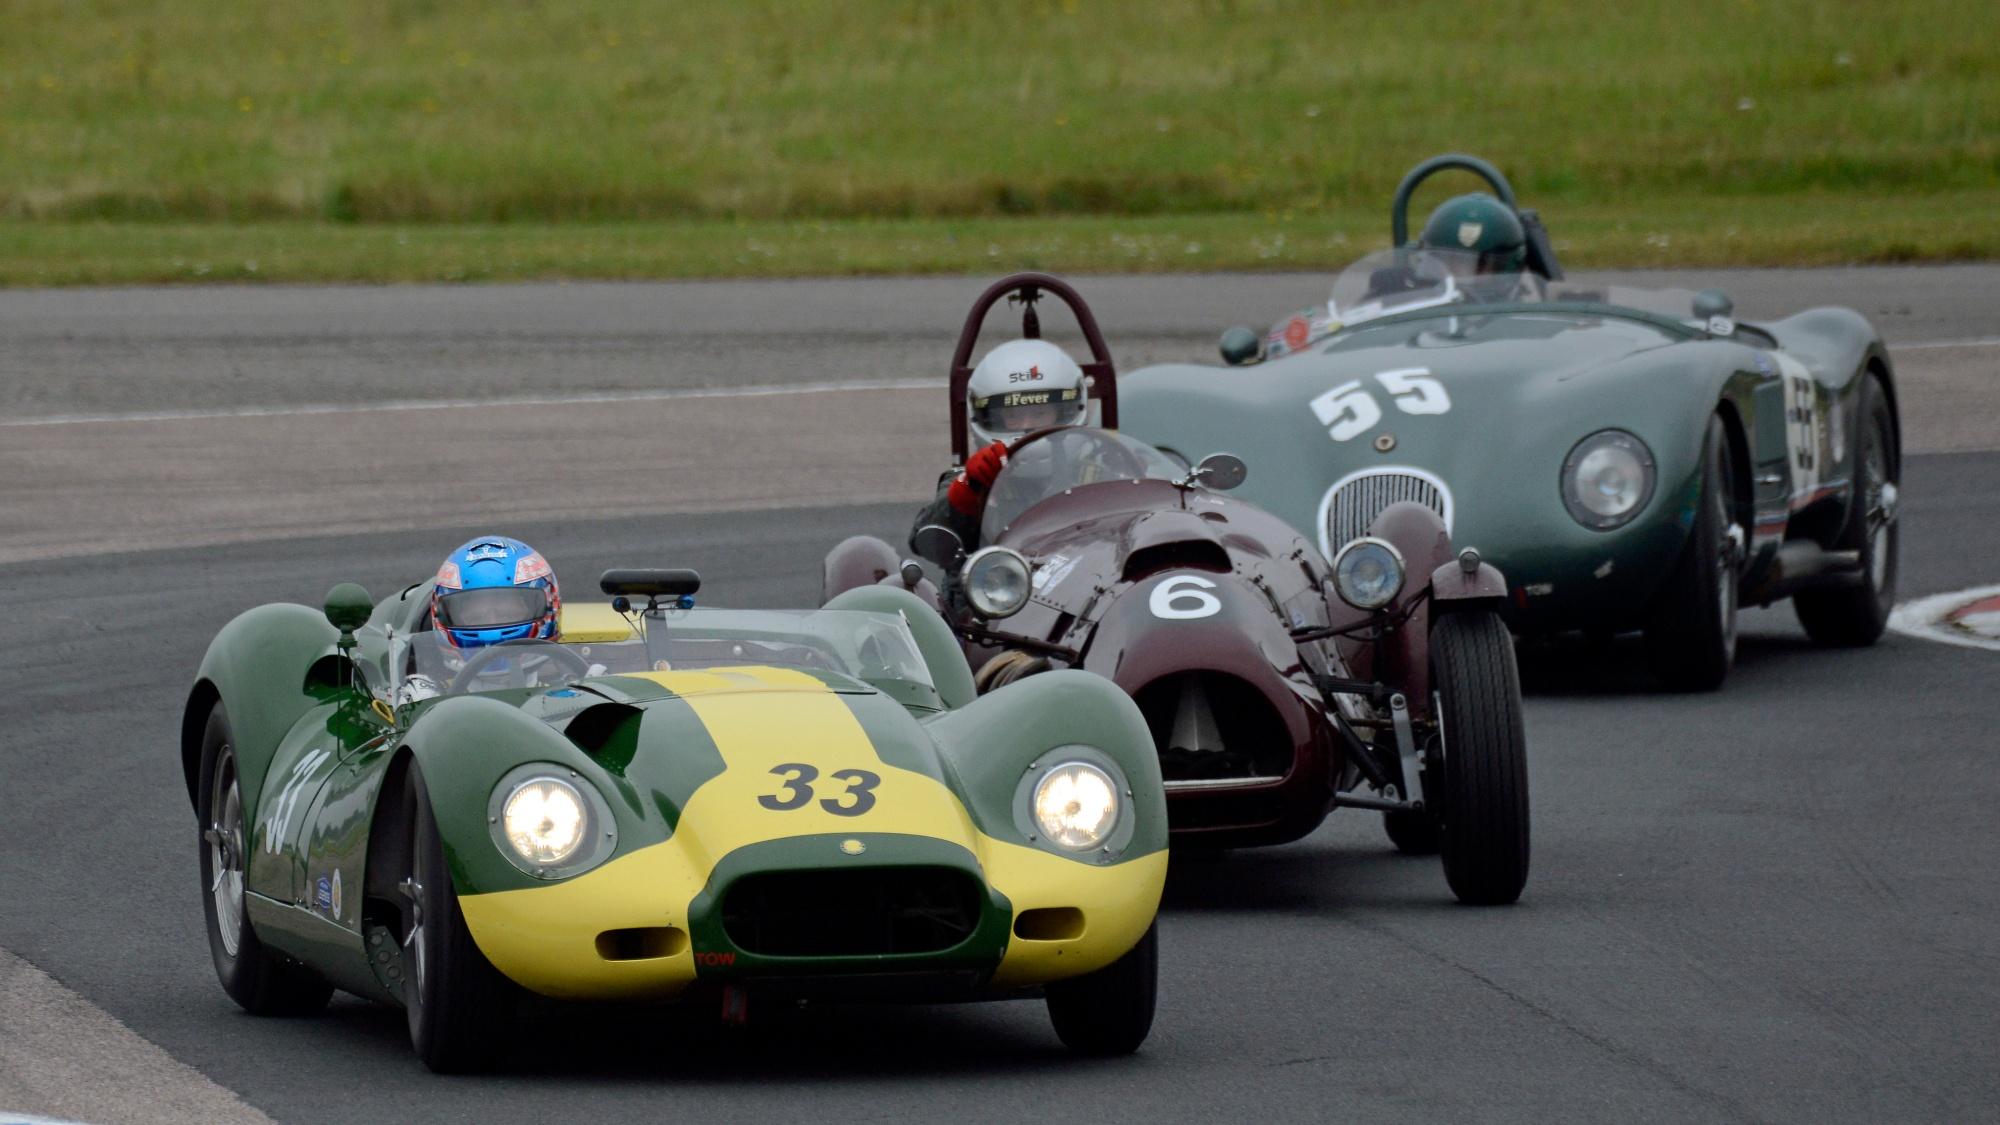 Jaguar Lister, Minshaw and Butcher